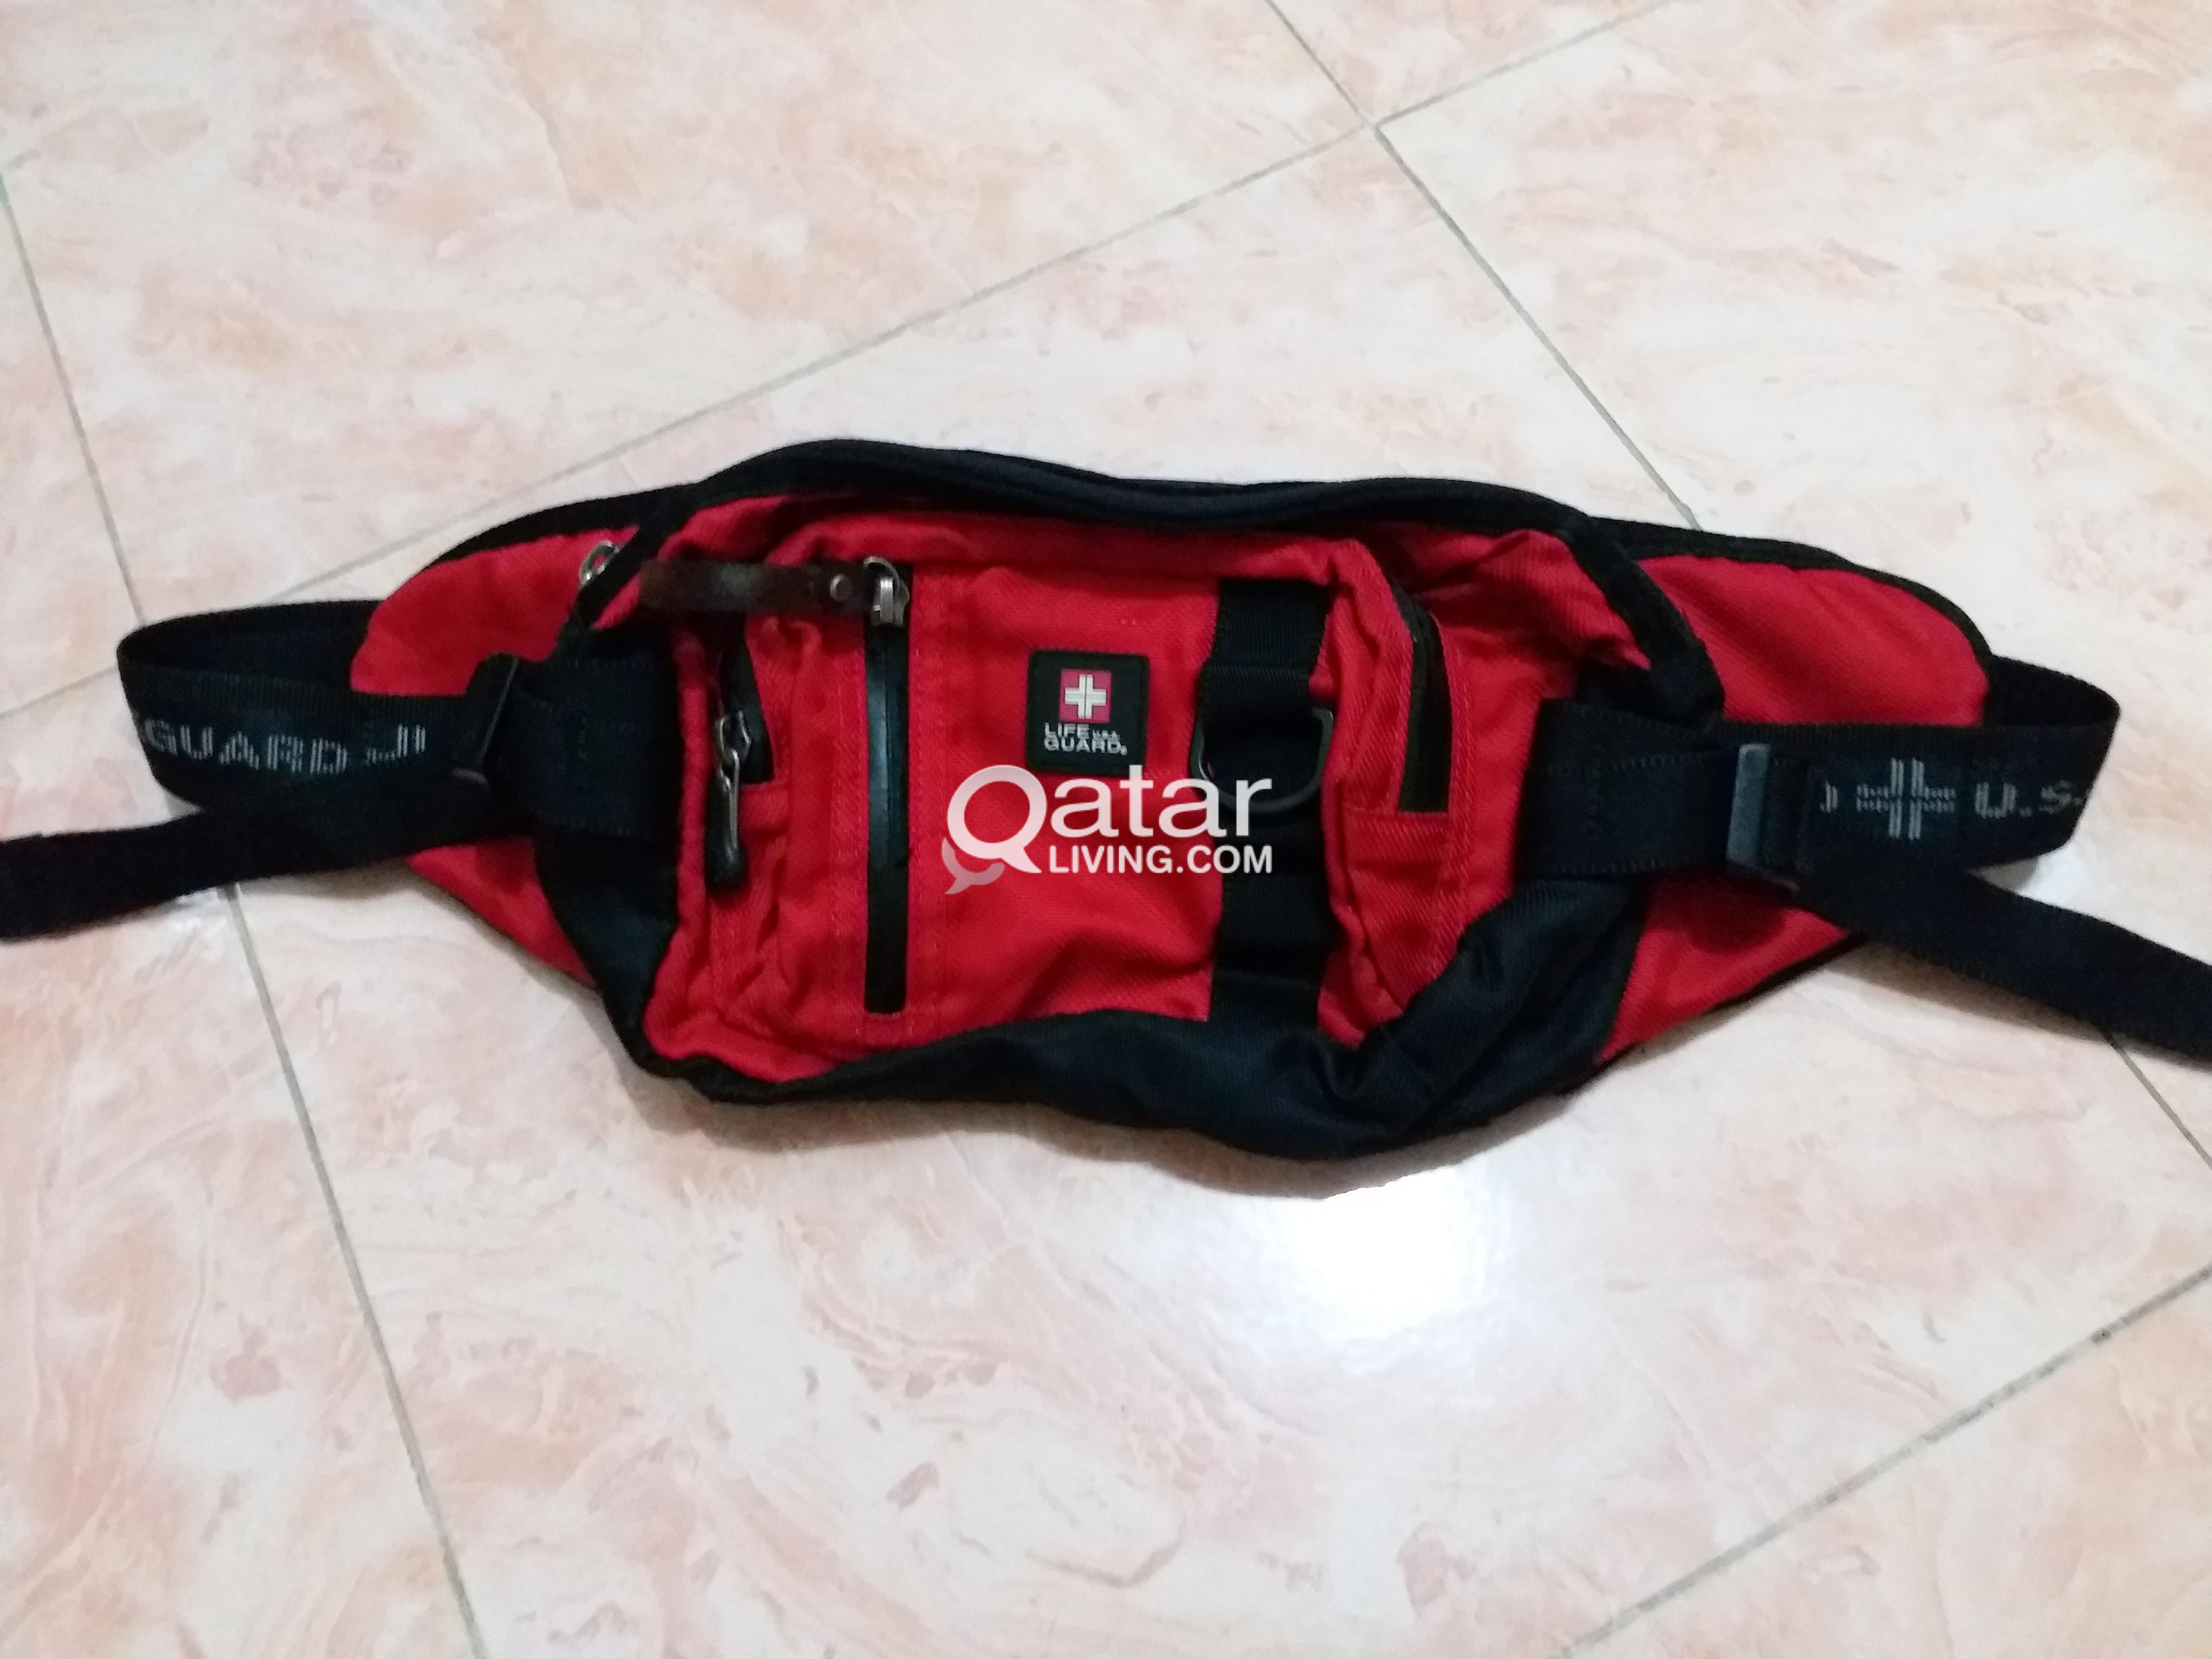 bee3c06d47f Mens waist Bags   Qatar Living